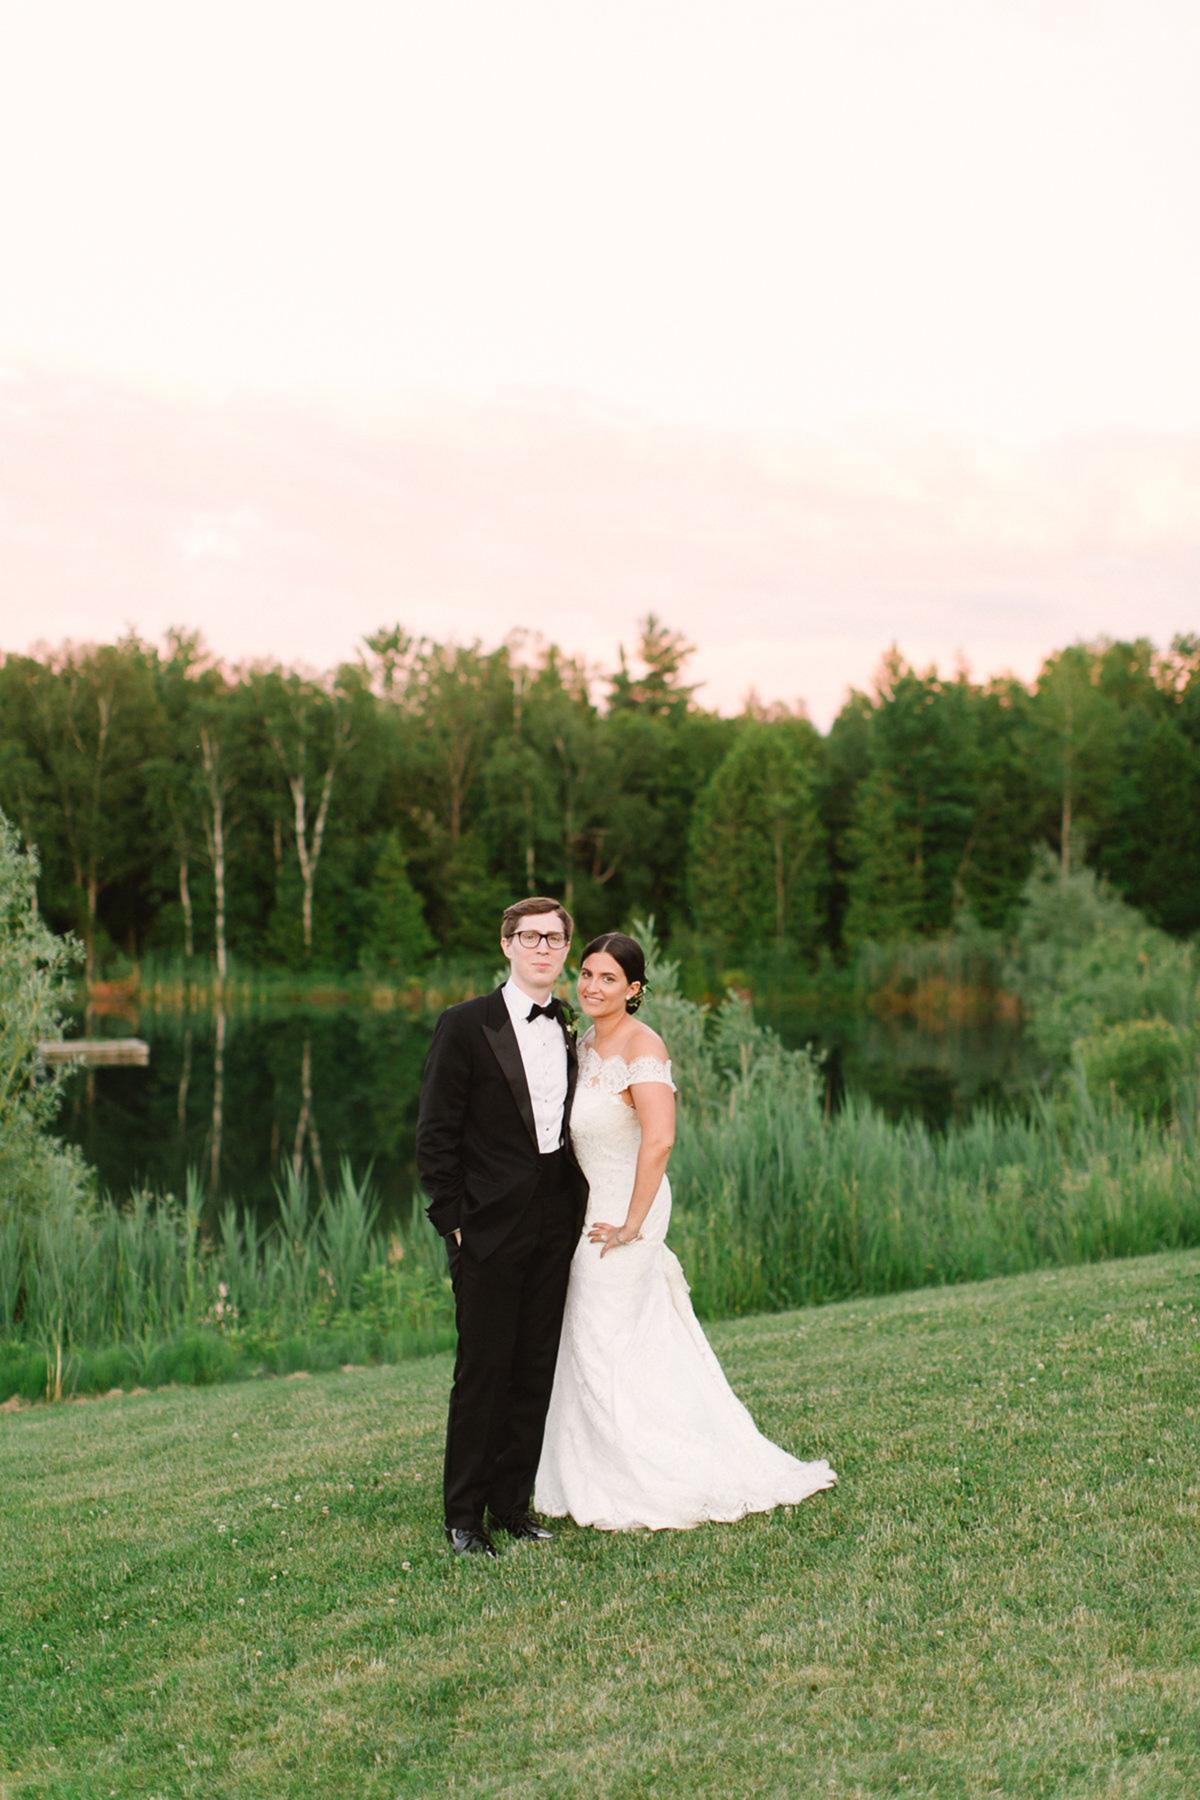 artiese-studios-vineyard-bride-swish-list-private-estate-cambridge-wedding-11.jpg